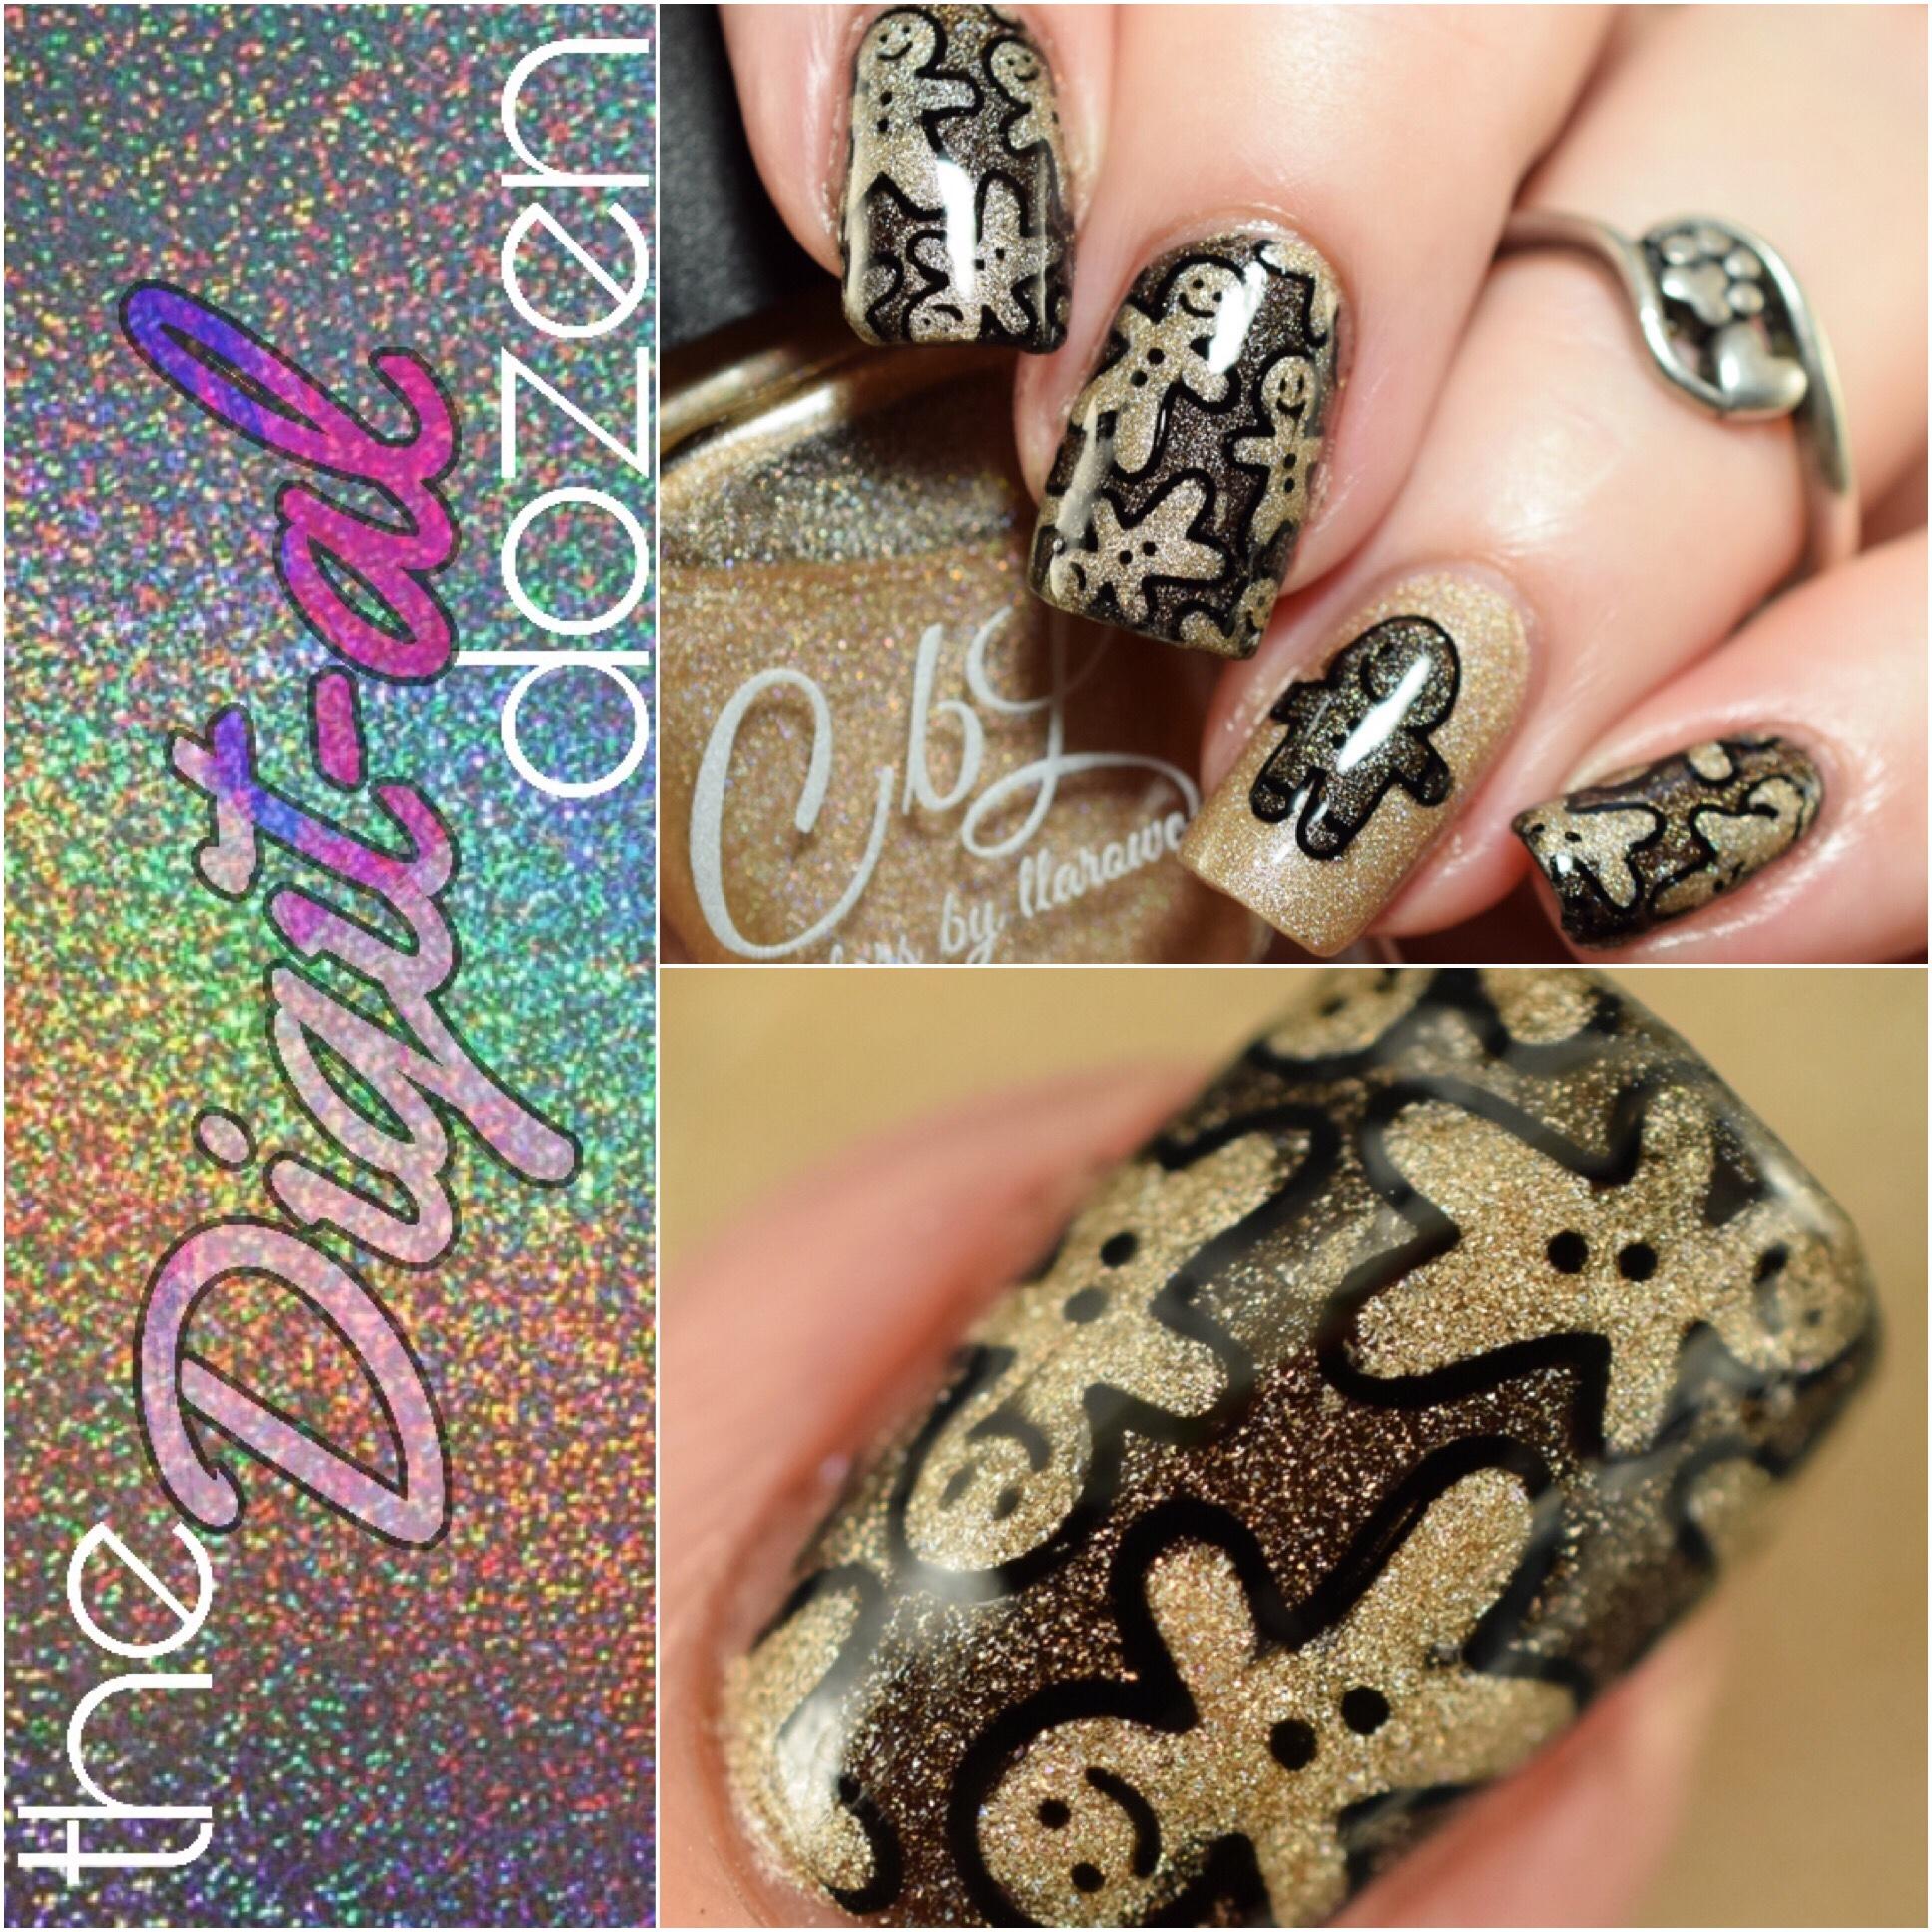 The Digit-al Dozen does Holo: Holoday Nails Day 3